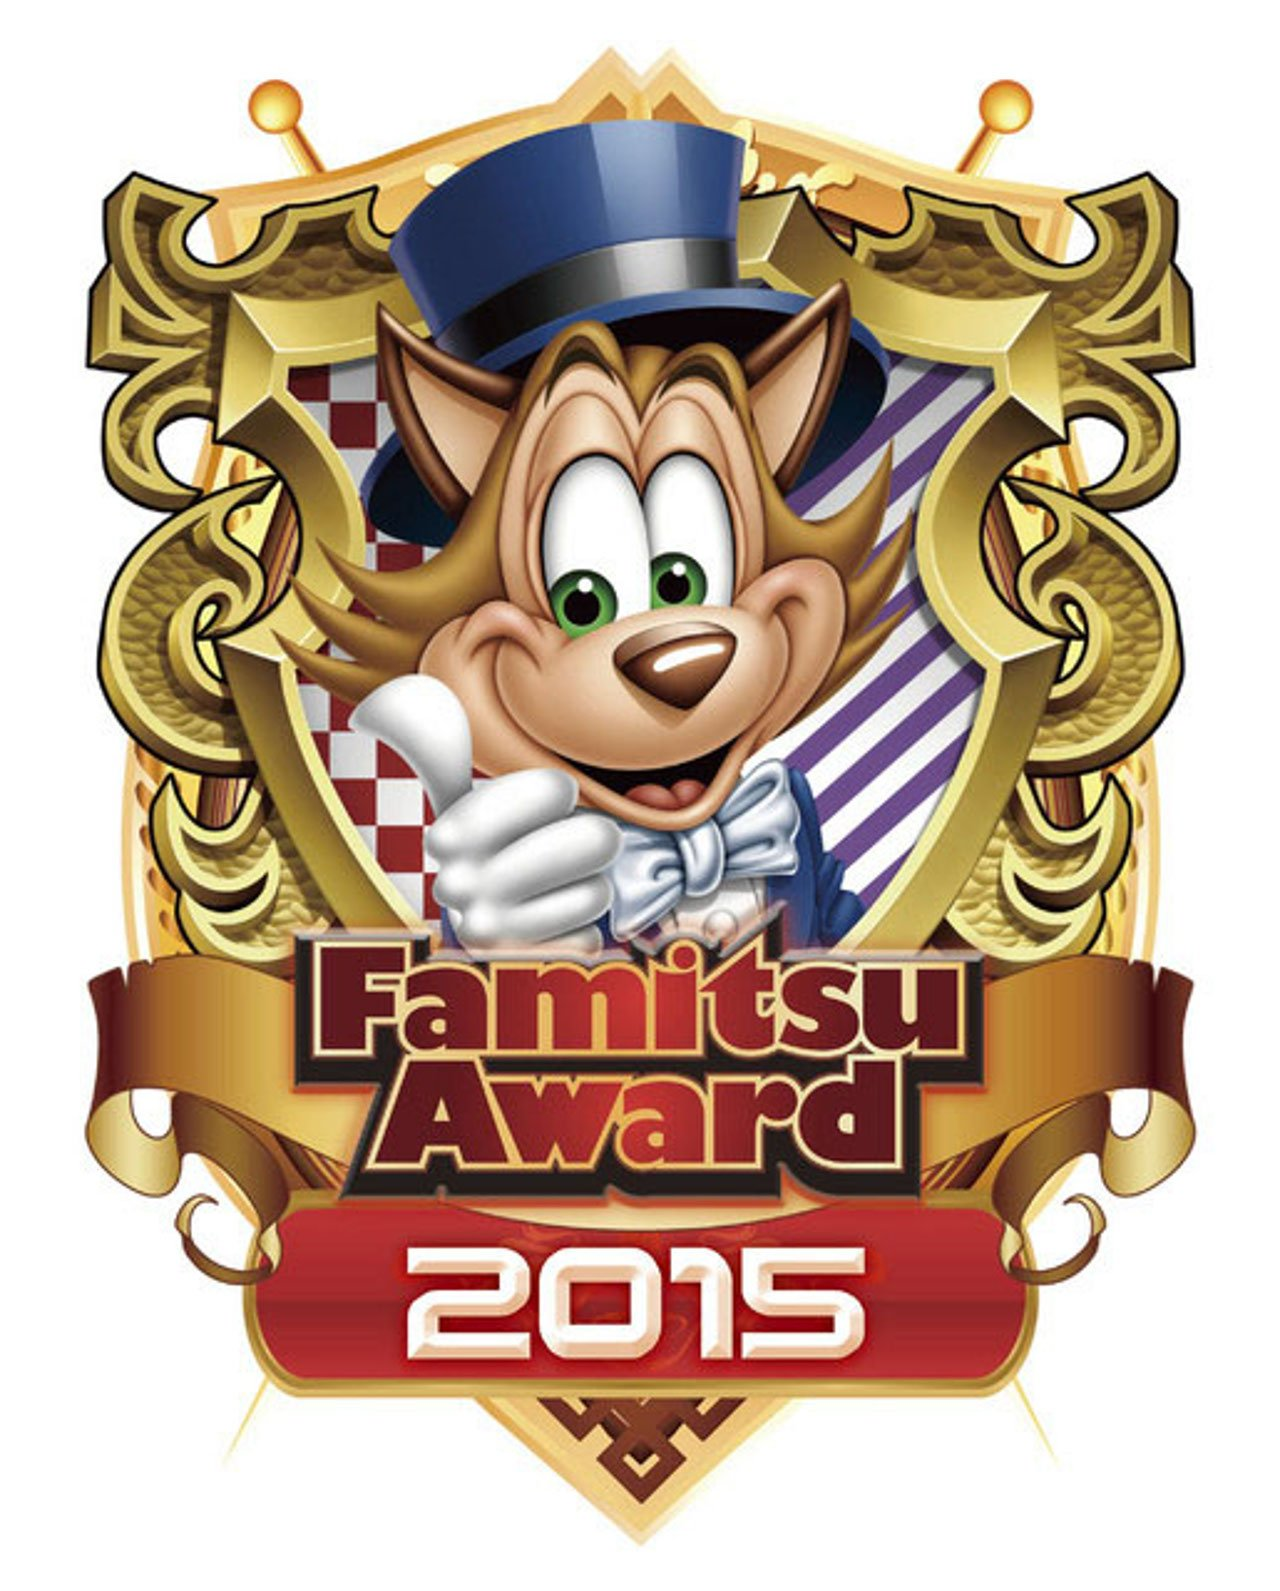 Famitsu Awards 2015: annunciati i vincitori